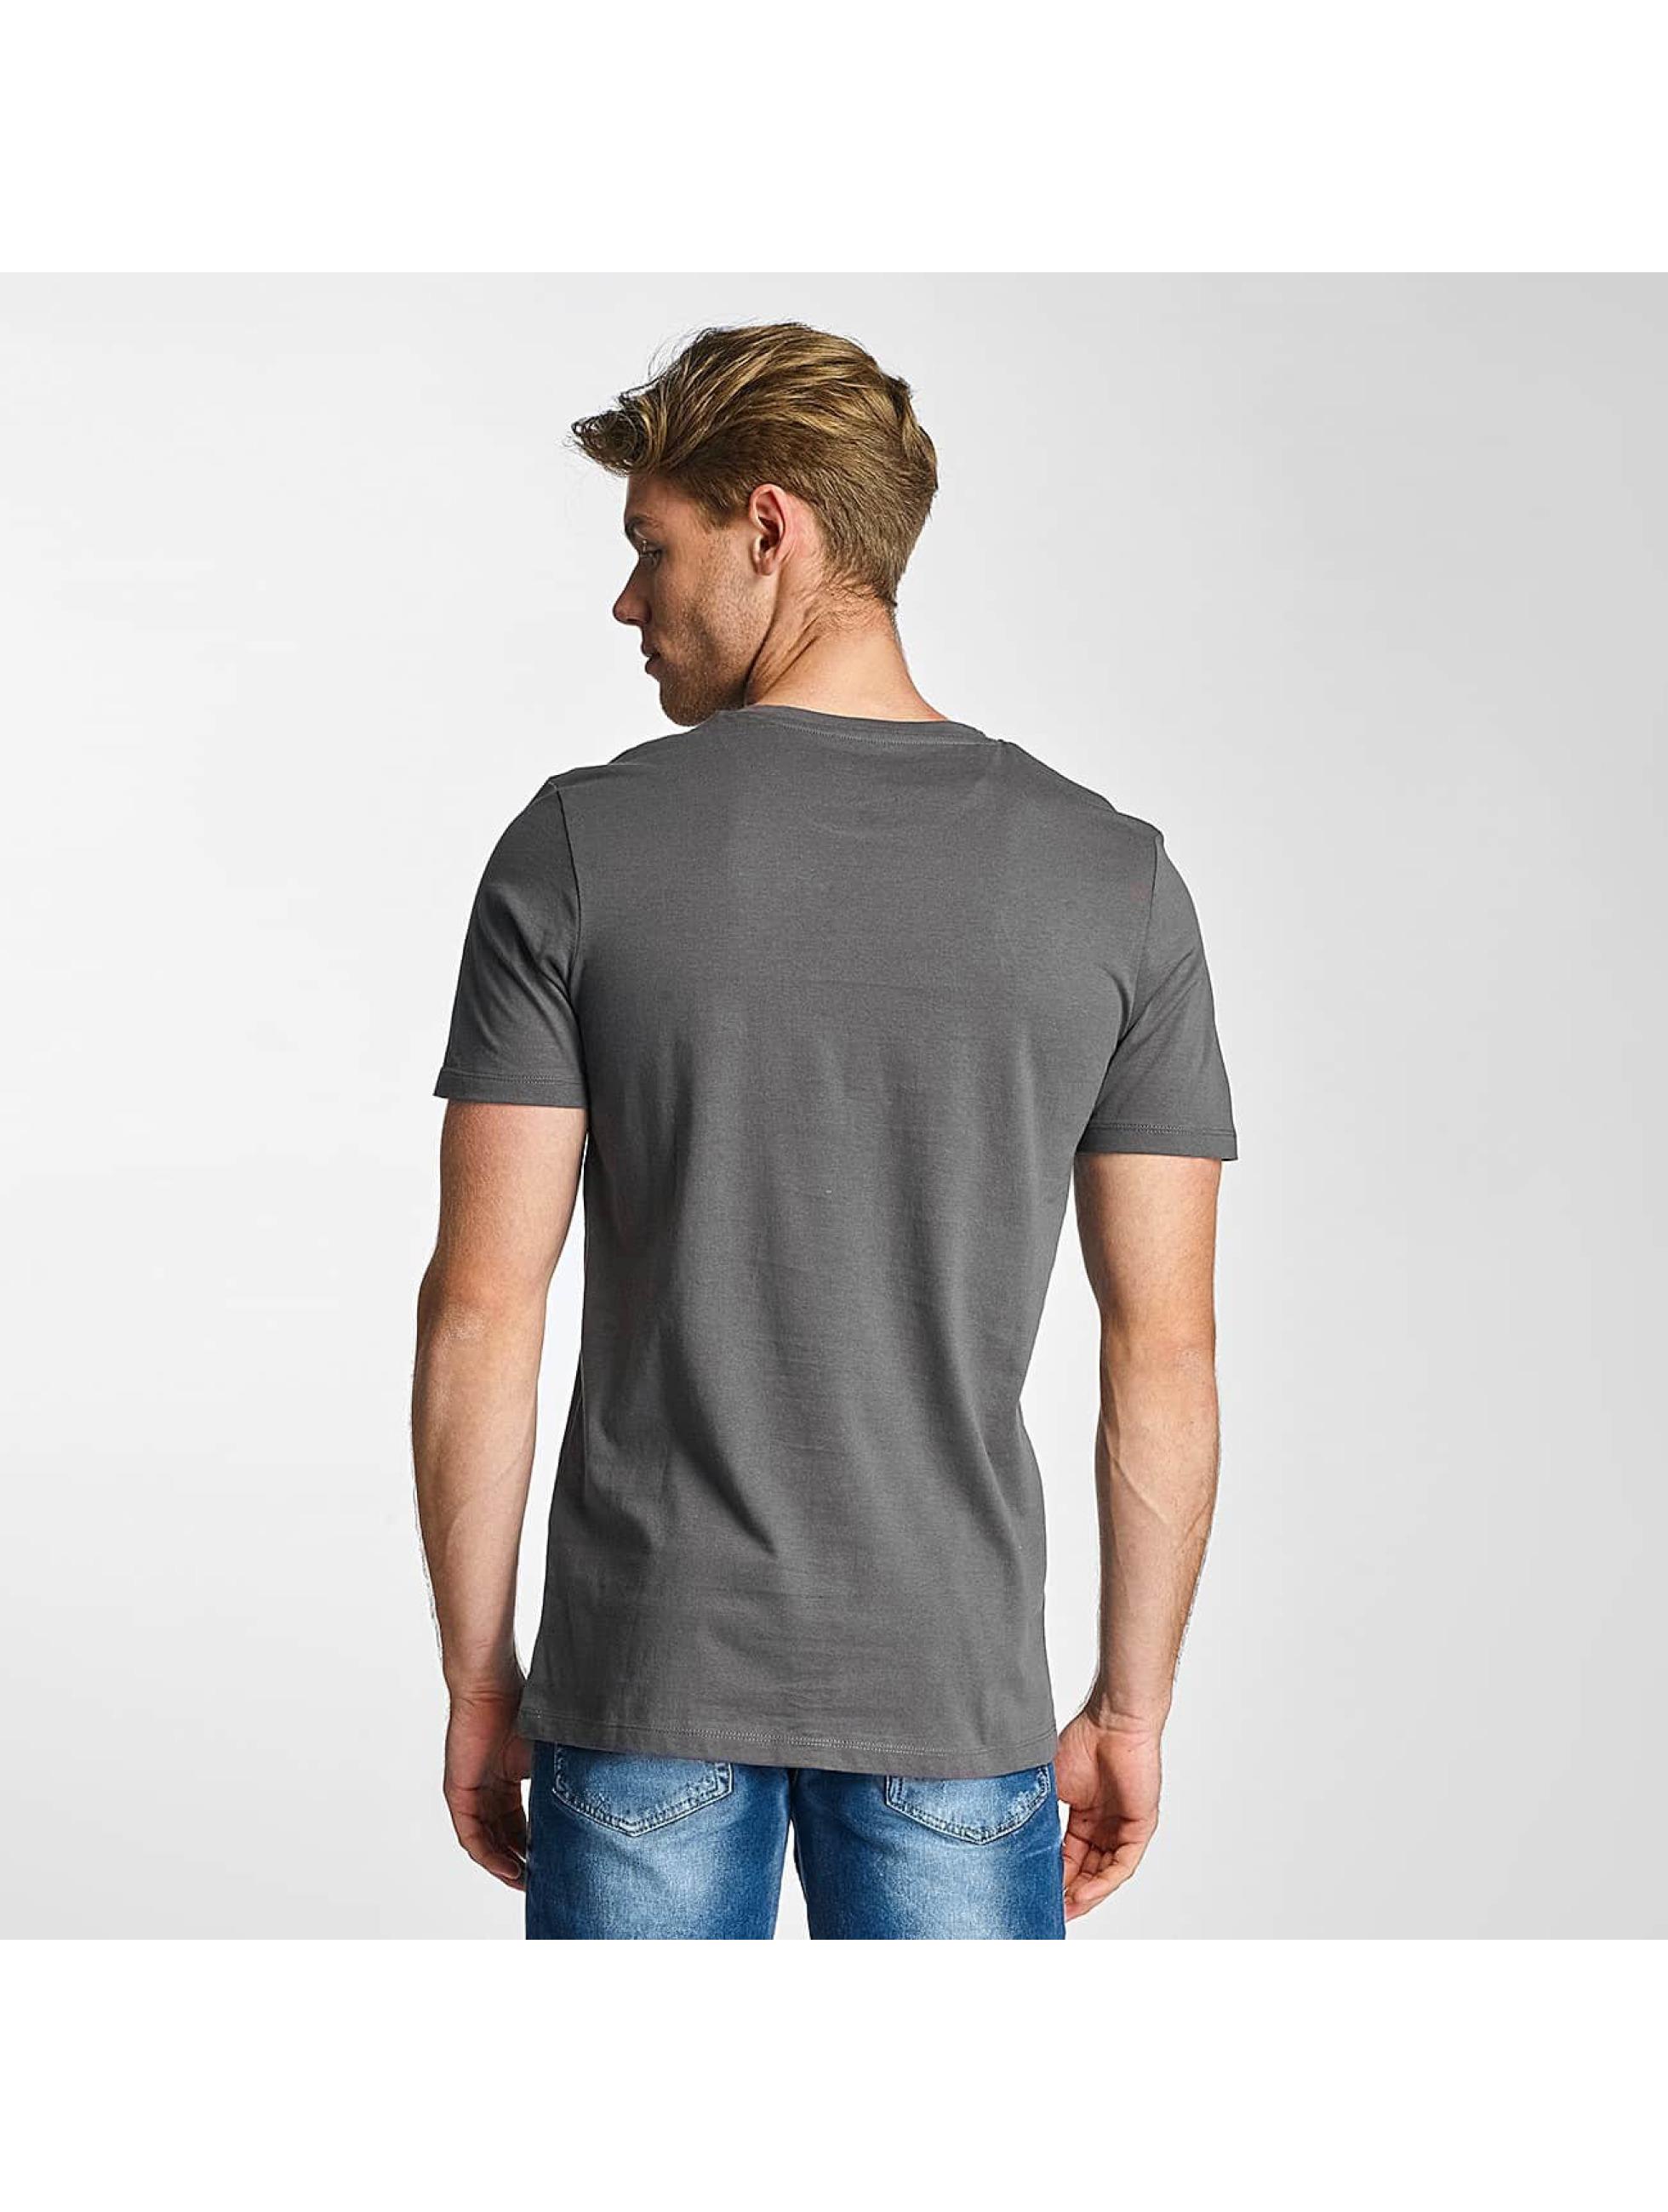 Jack-amp-Jones-Uomini-Maglieria-T-shirt-jorSamuel